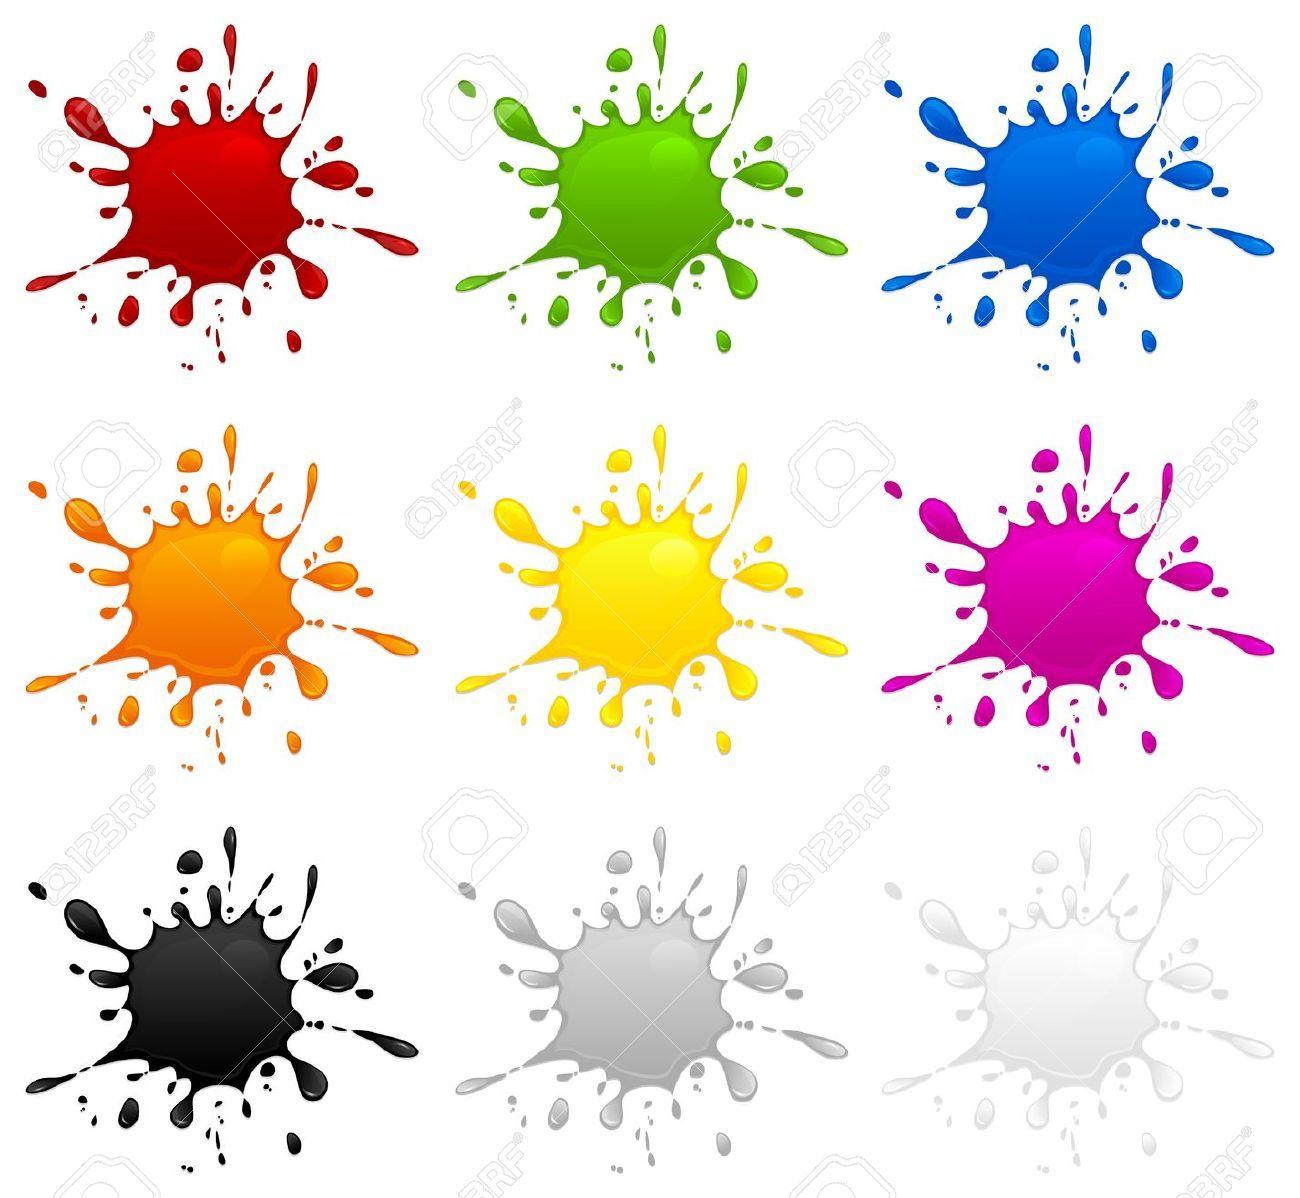 Manchas De Colores Manchas De Tinta Salpicadura De Acuarela Manchas De Colores